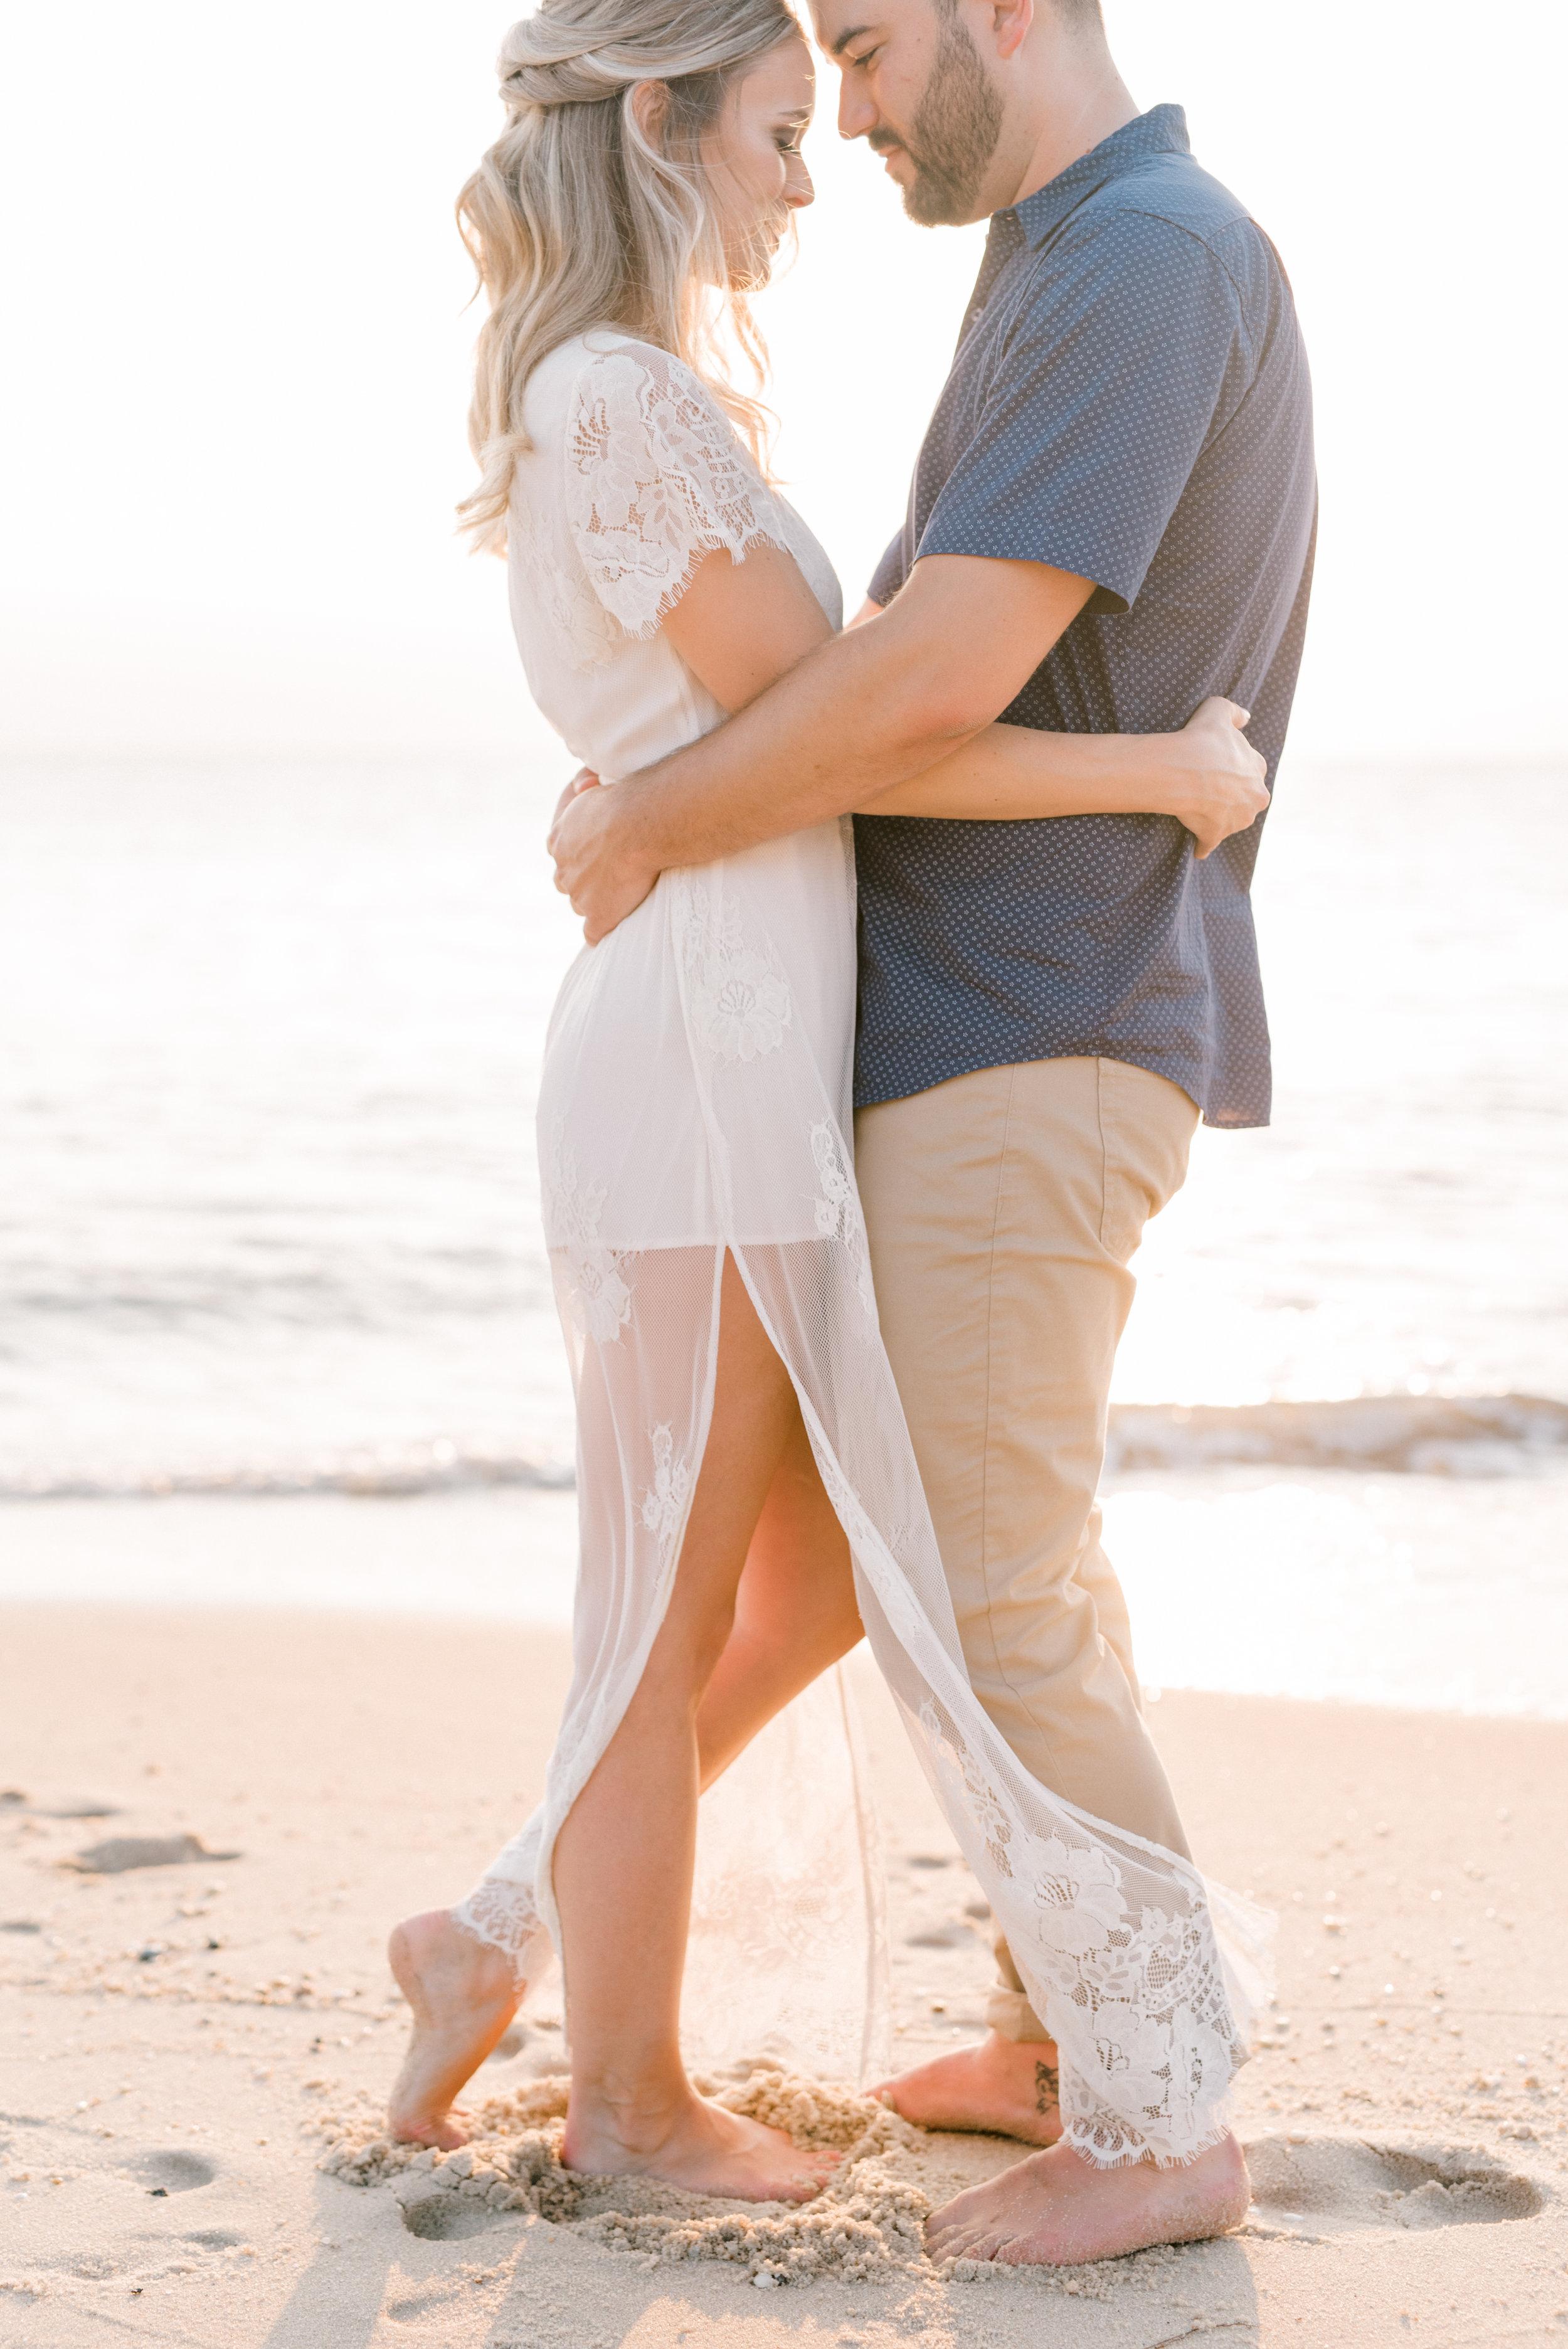 cape-may-beach-engagement-photos-haley-richter-photography-044.jpg